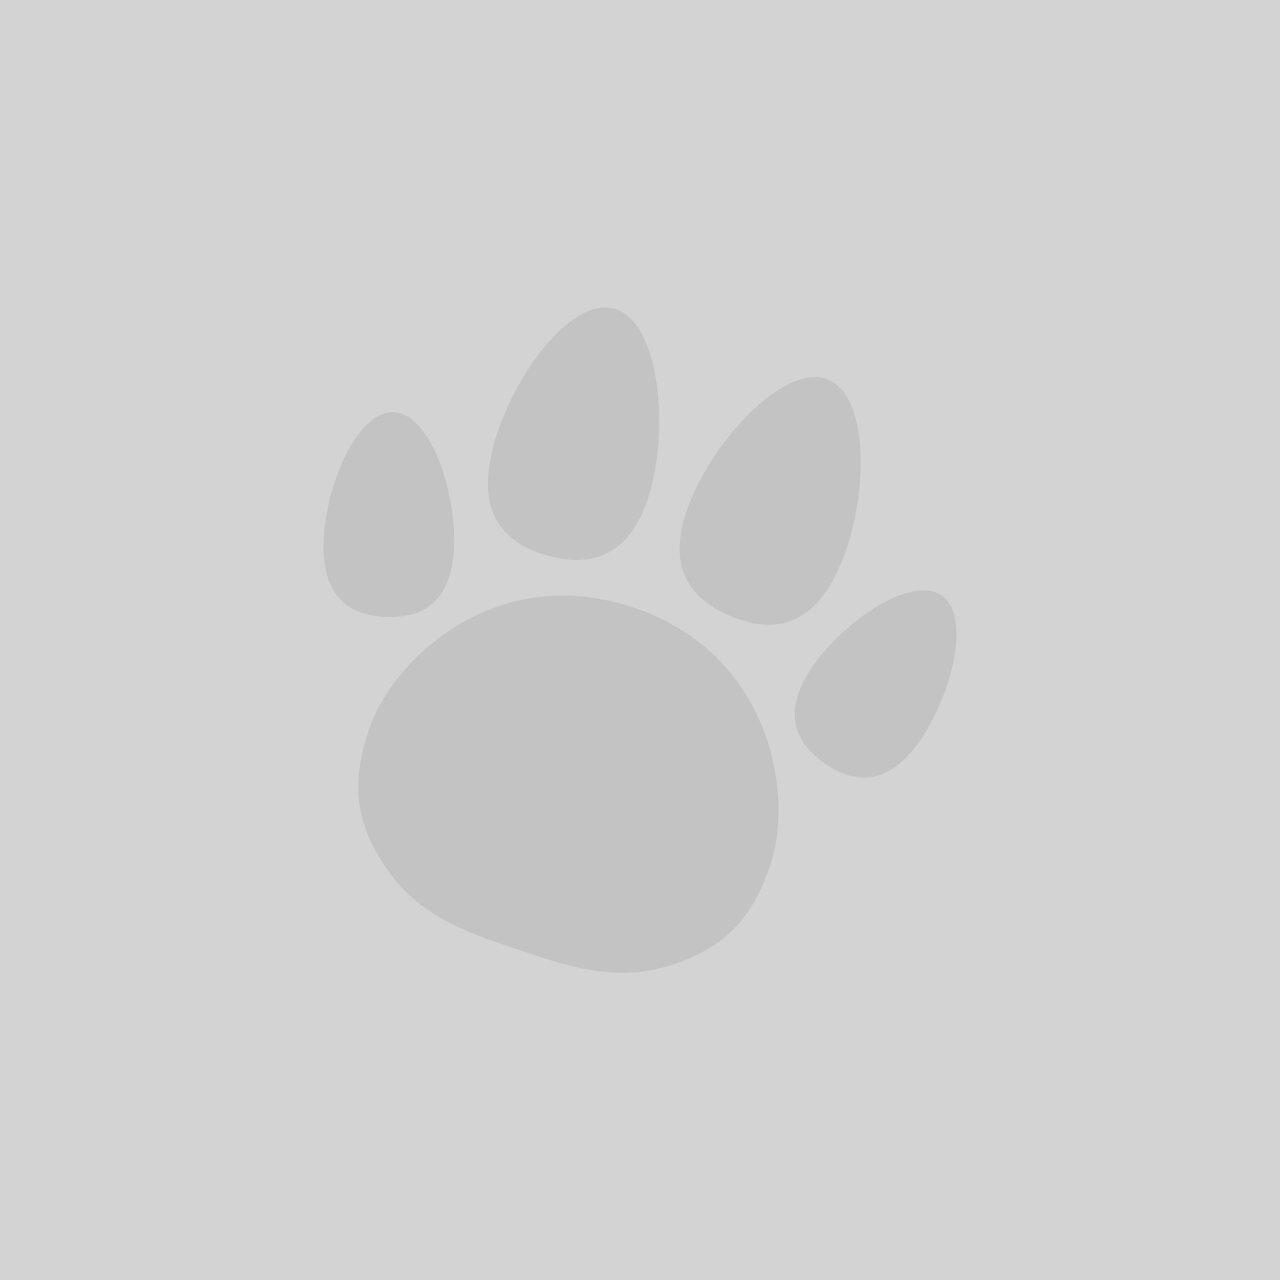 Doodlebone Airmesh Dog Harness Teal Small